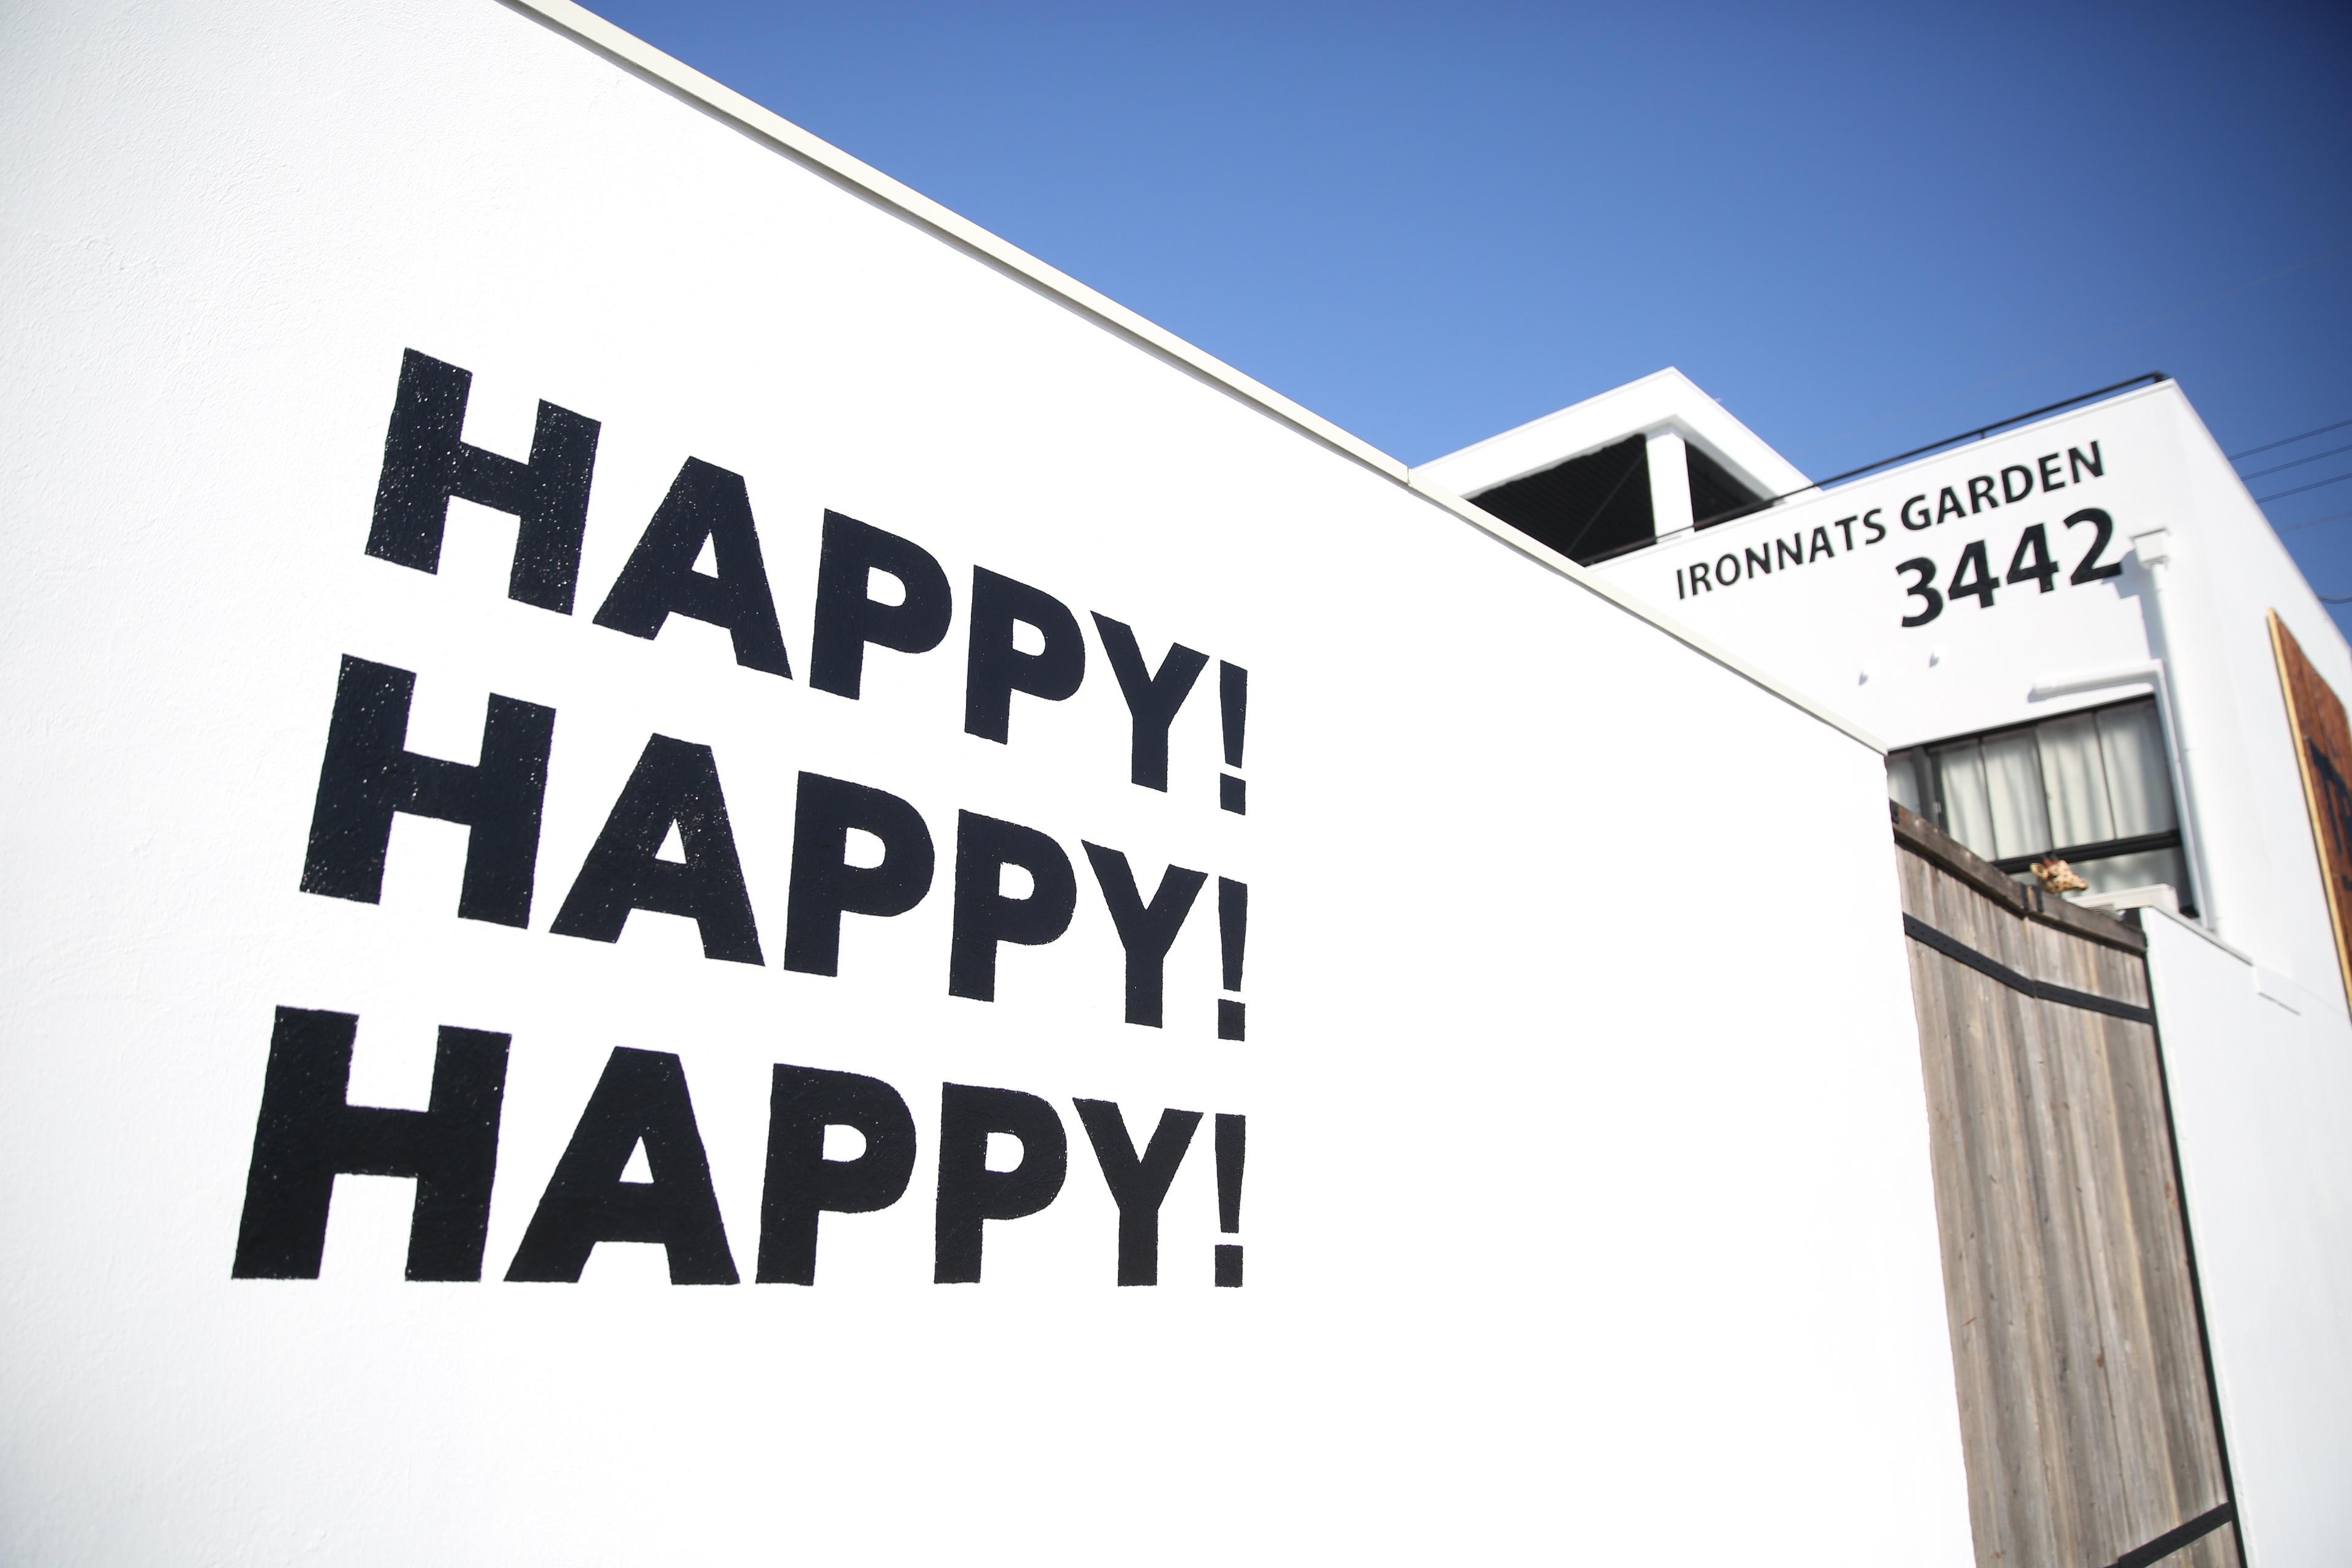 IRON NATS 幸せの壁